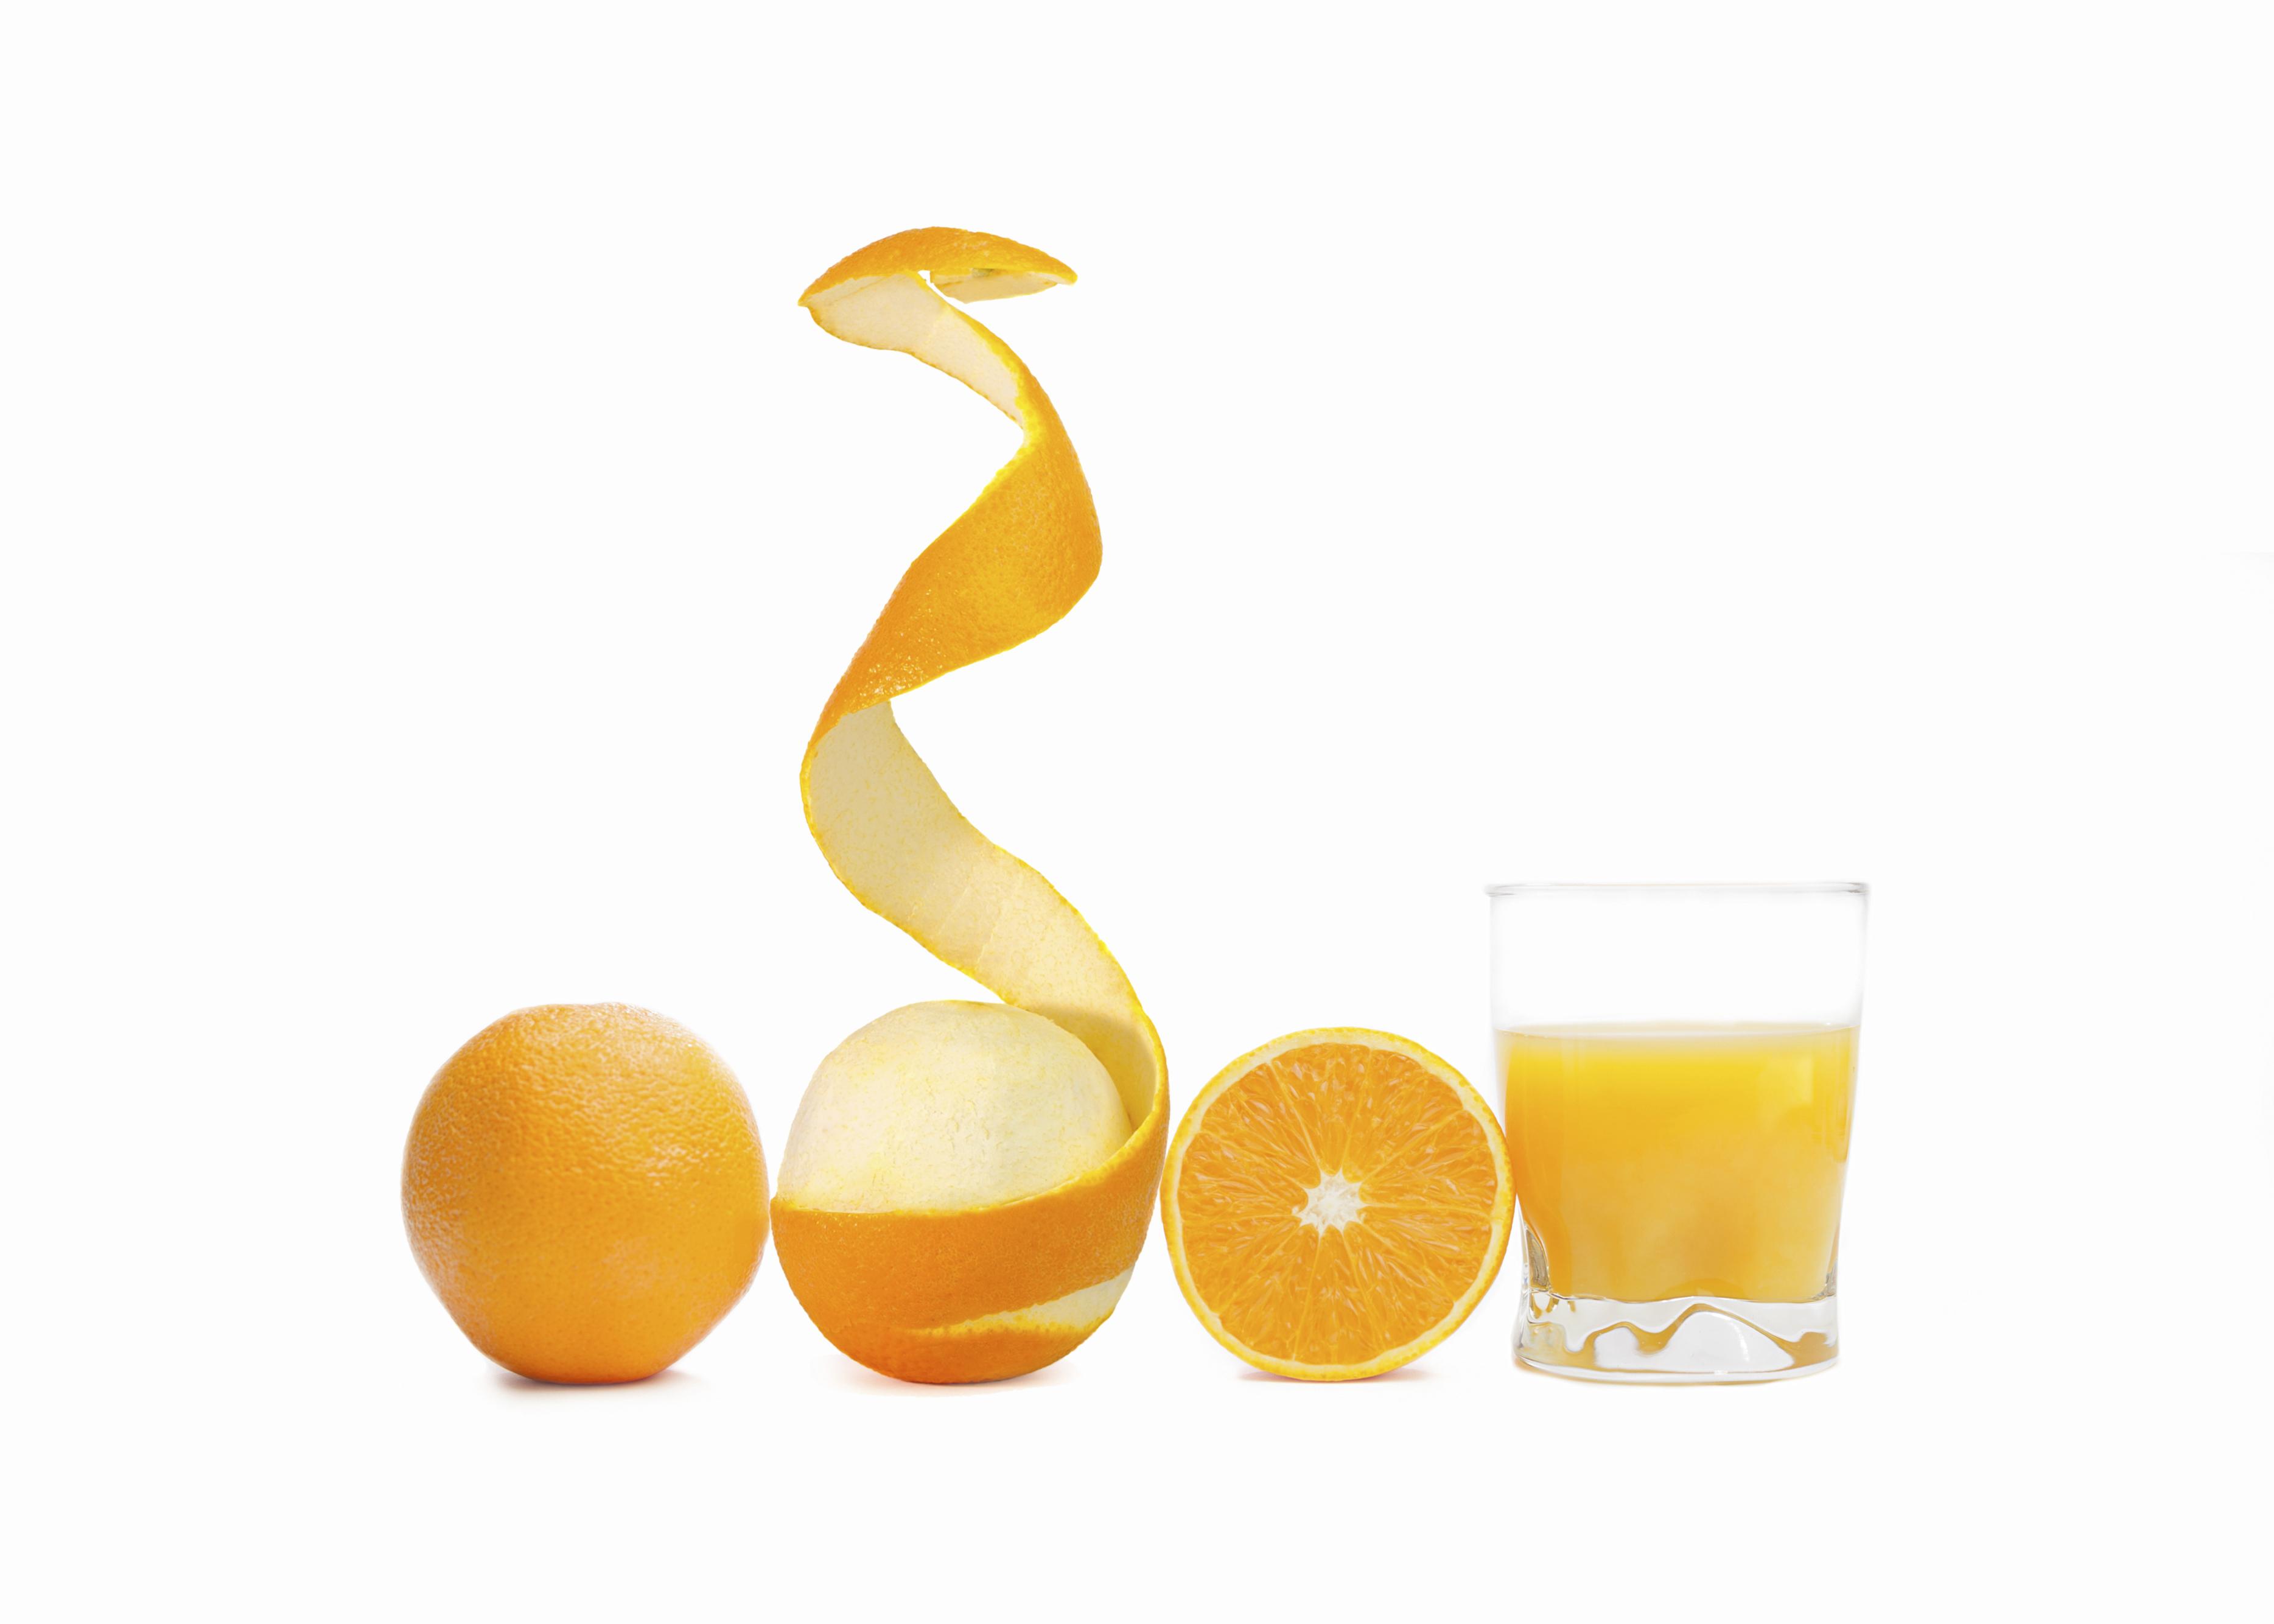 Should Vegetarians Drink Oranges Juice With Meals